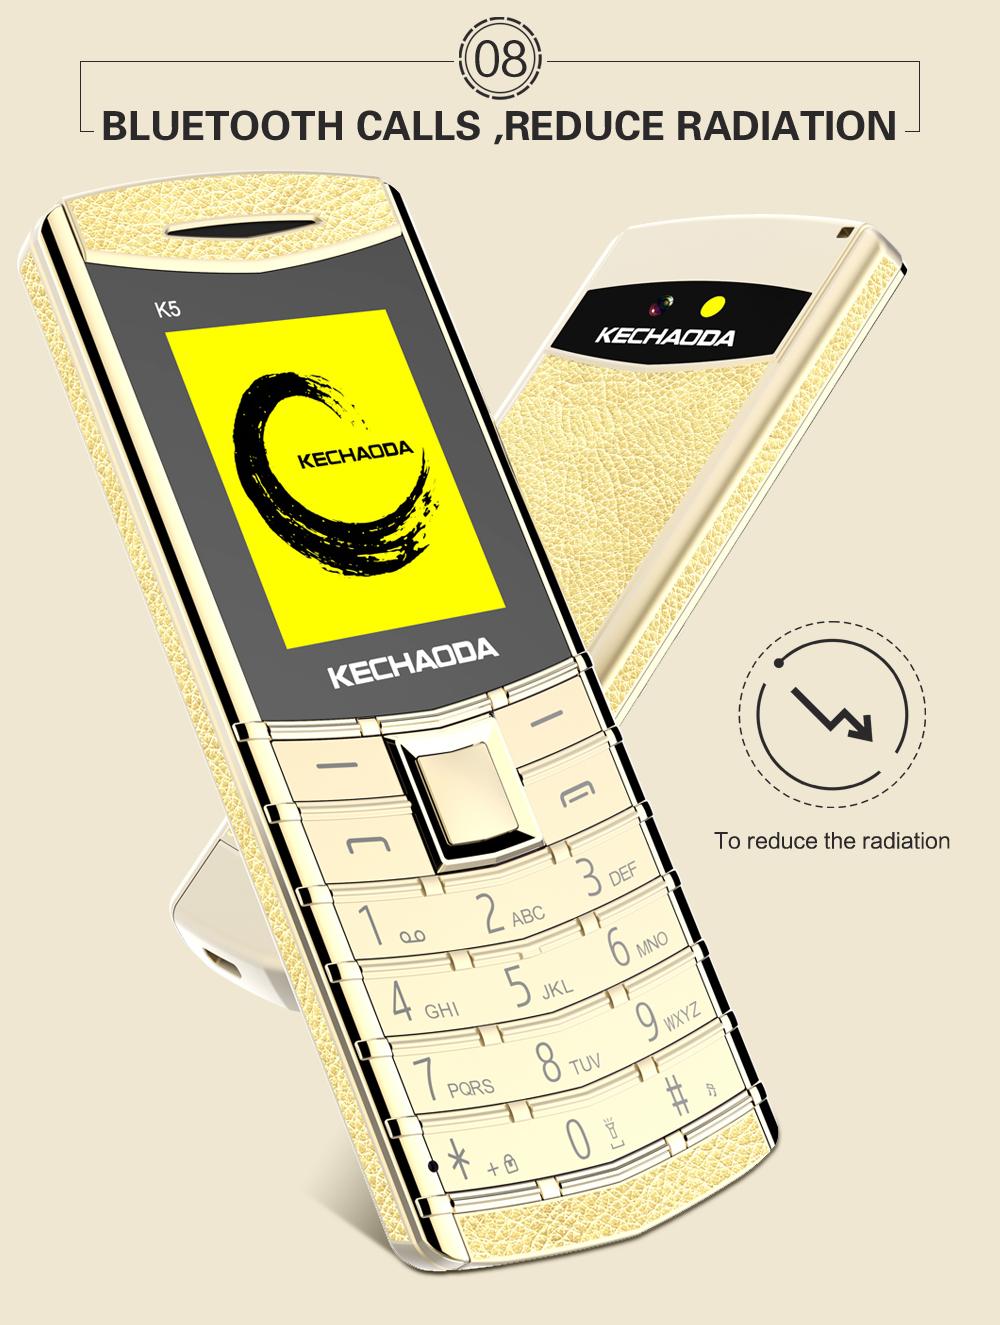 KECHAODA K5 1 8 Inch 500mAh bluetooth Dialer With Vibration Dual SIM Card  Dual Standby Ultra-thin Mini Card Phone